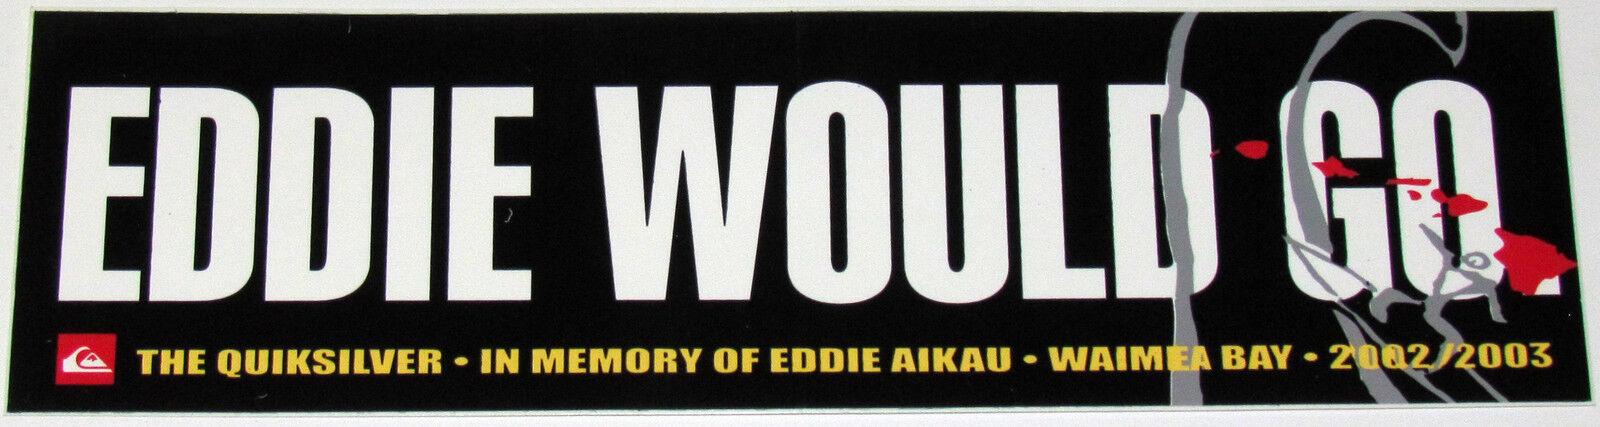 2002 Mint Original Eddie Would Go Aikau Waimea Bay Hawaii Surfing Contest Decal